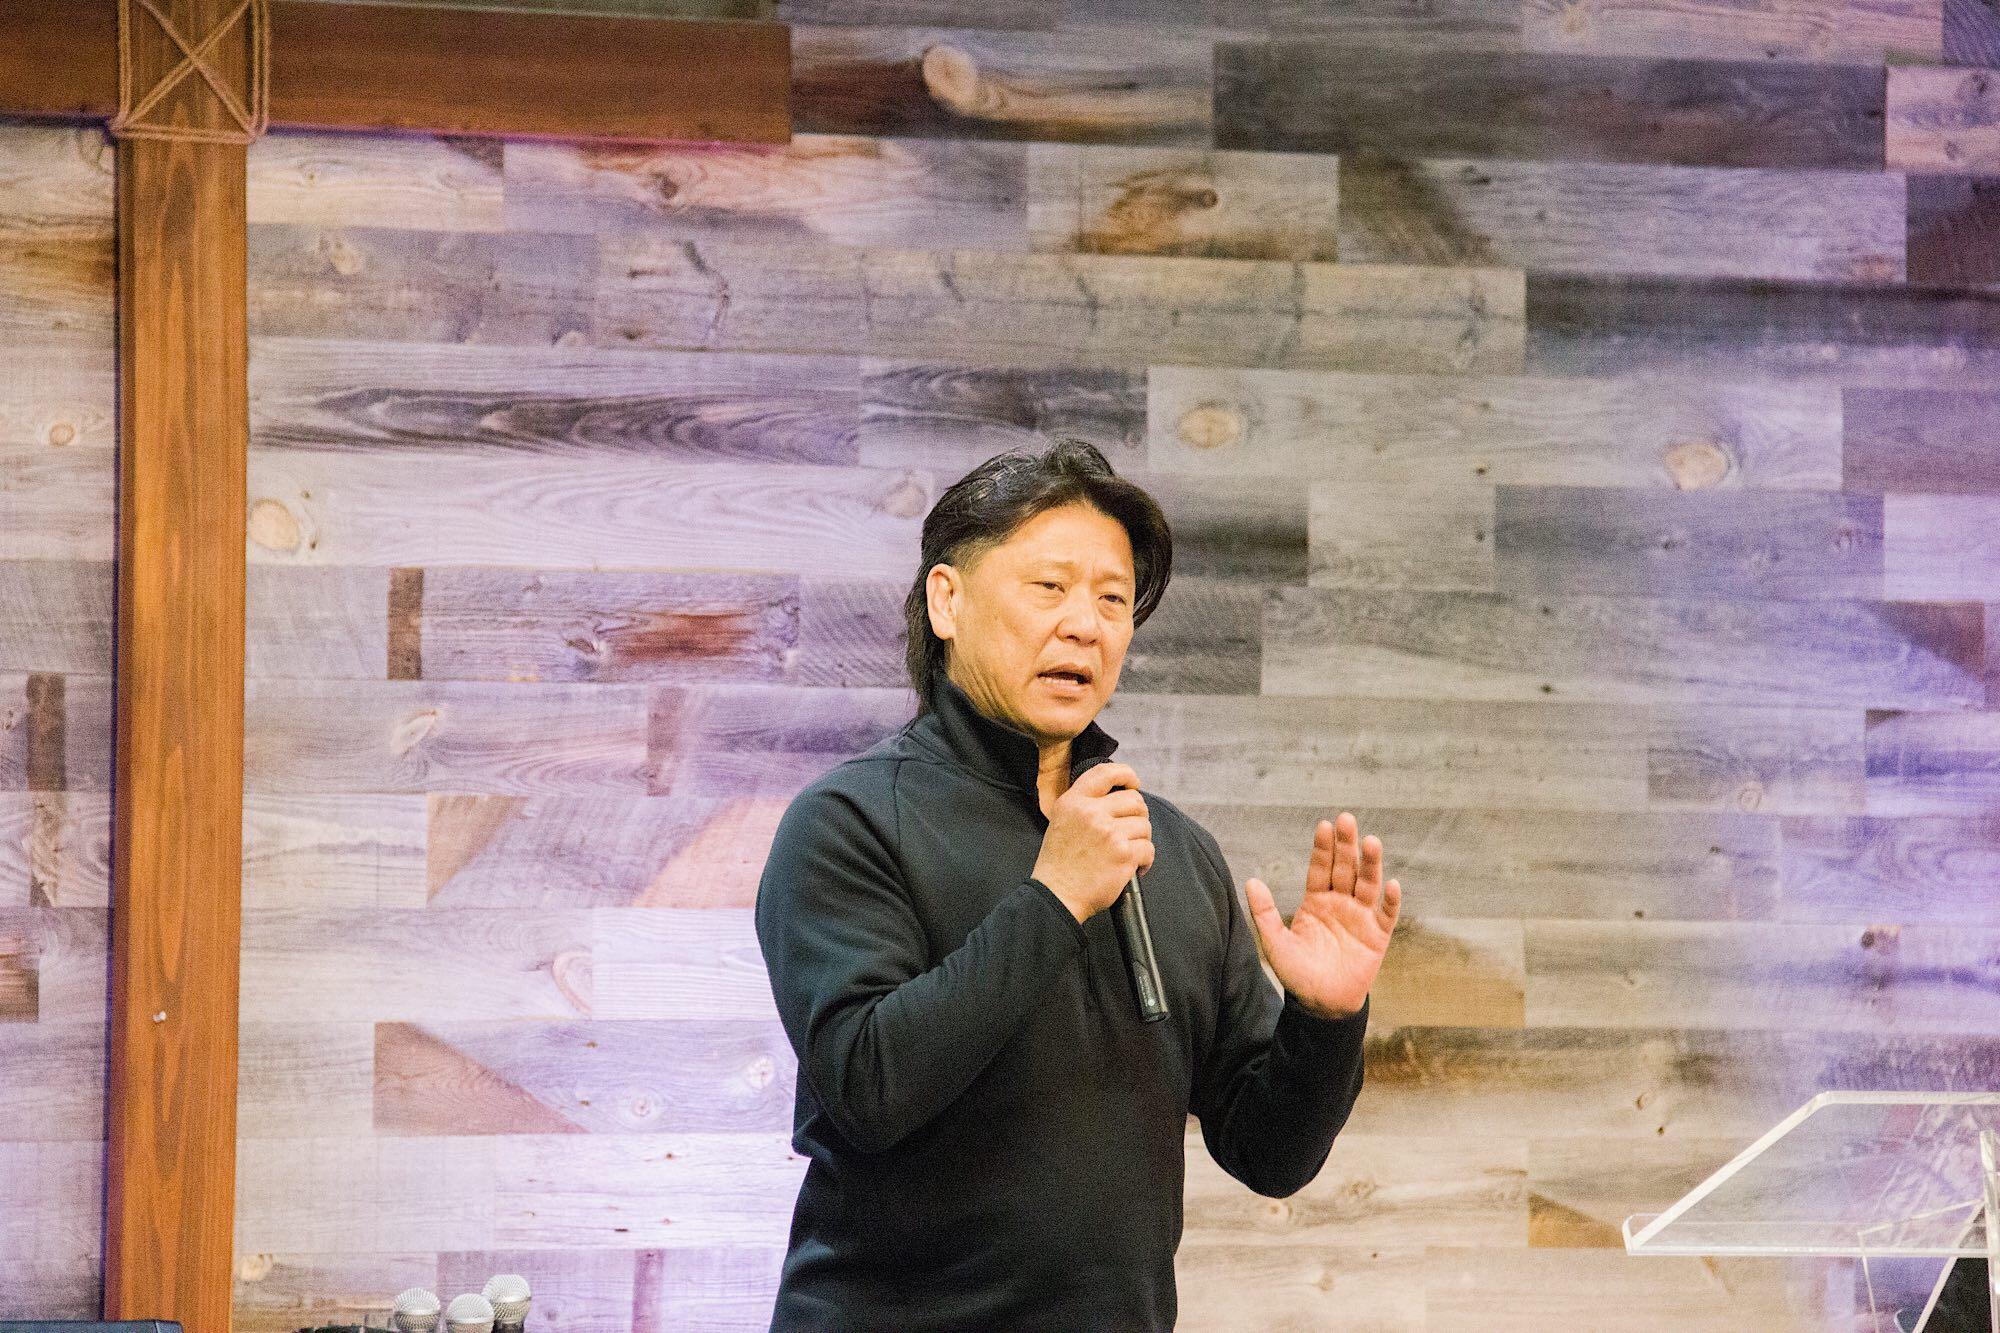 Pastor Roger's sharing